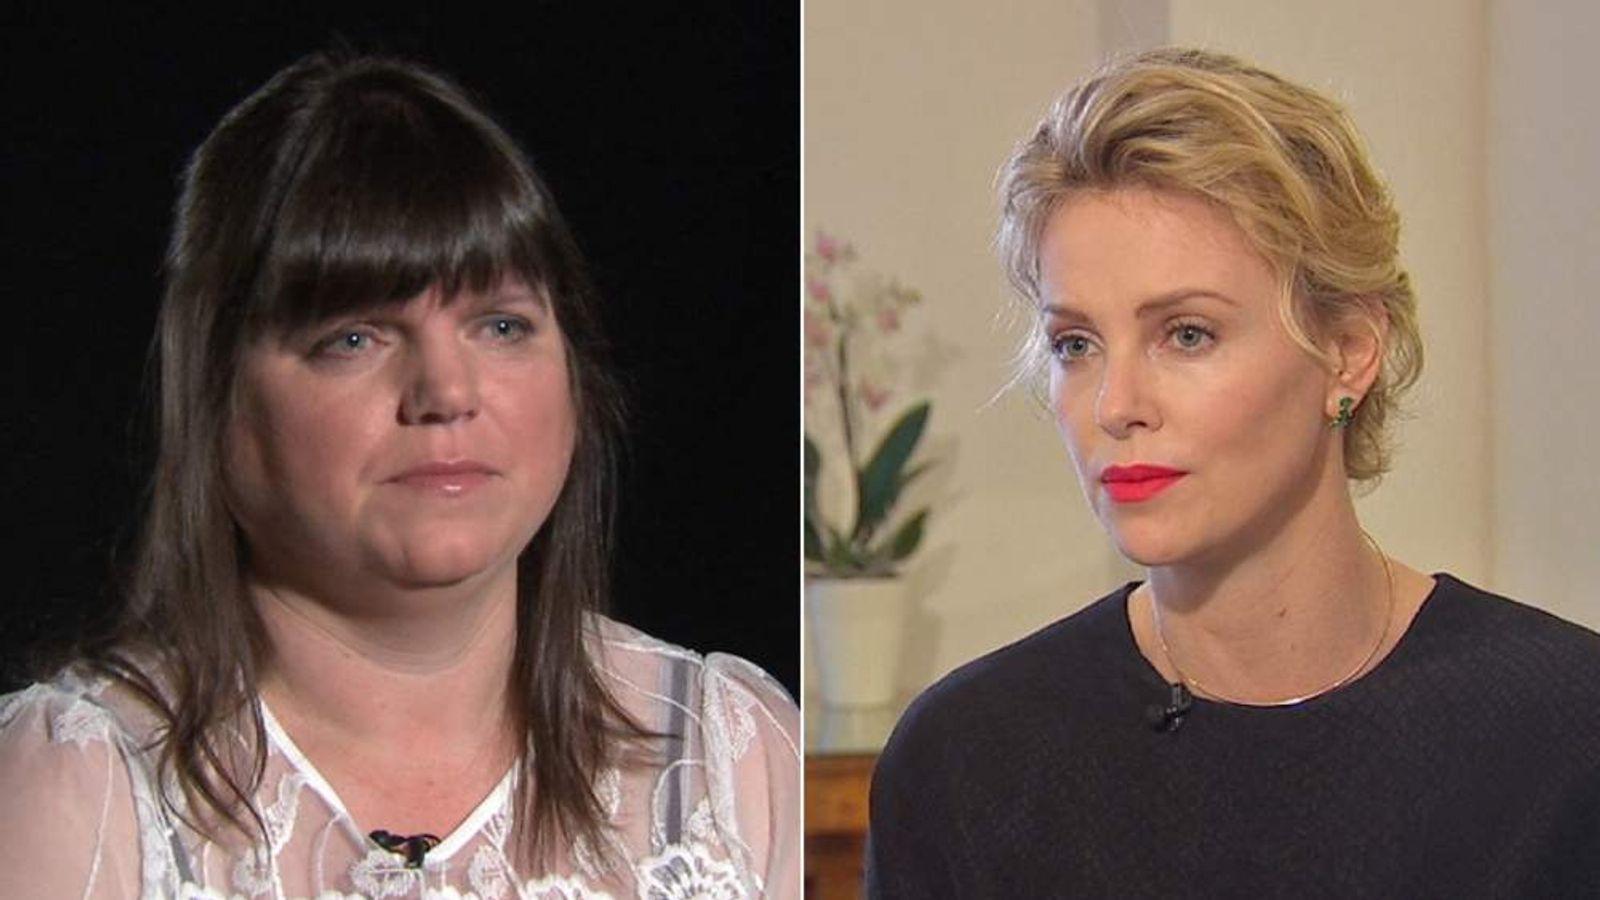 Rape victim Jill Saward (left) and actress Charlize Theron (right).